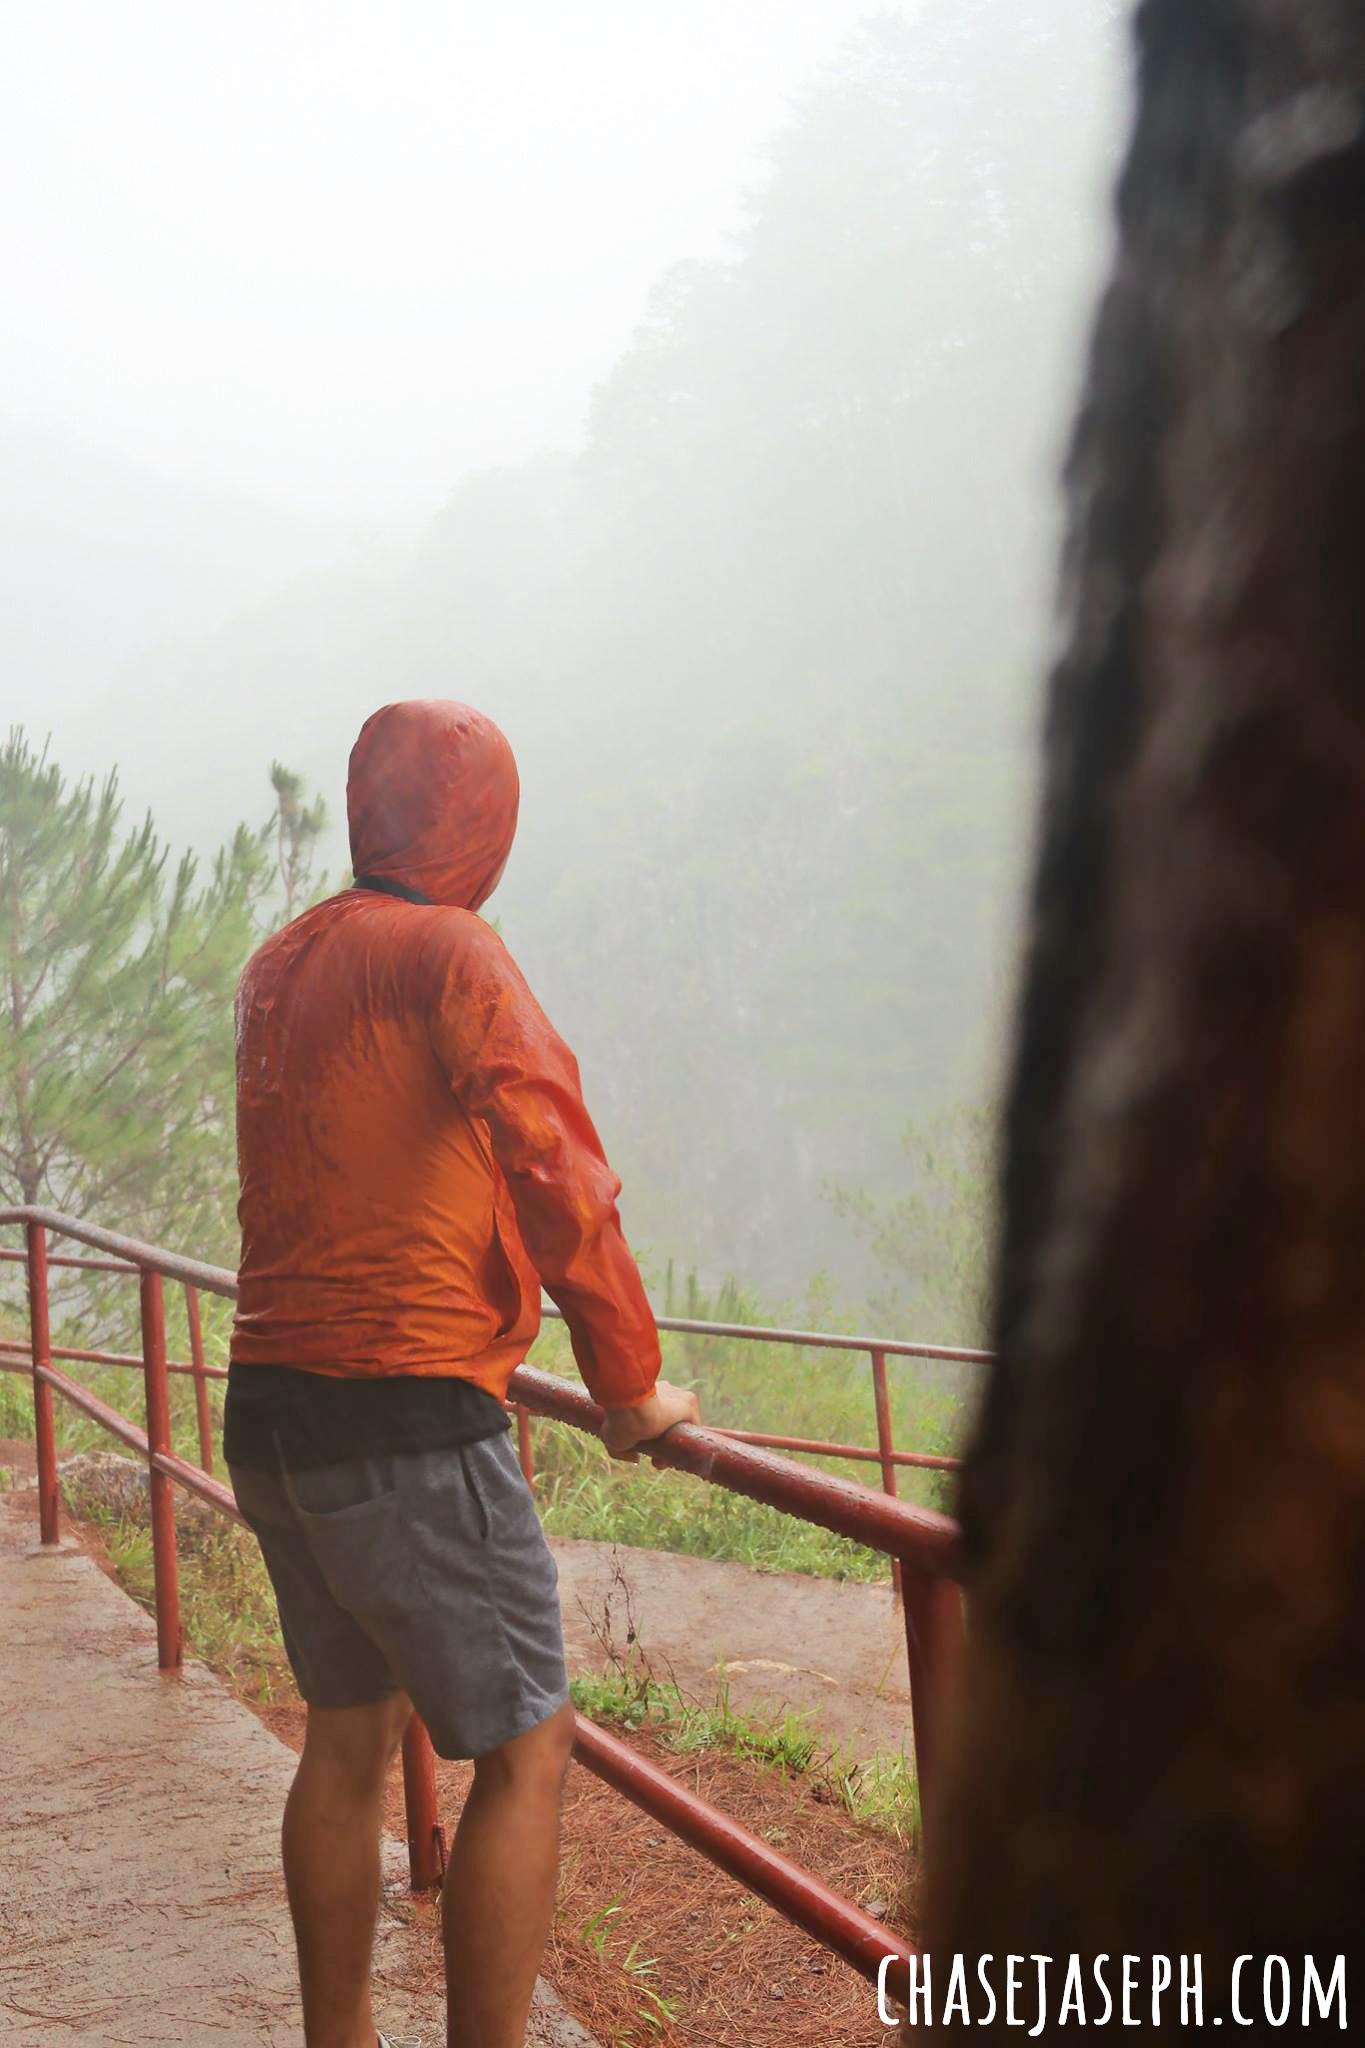 Sagada, Mountain Province (Travel Guide)